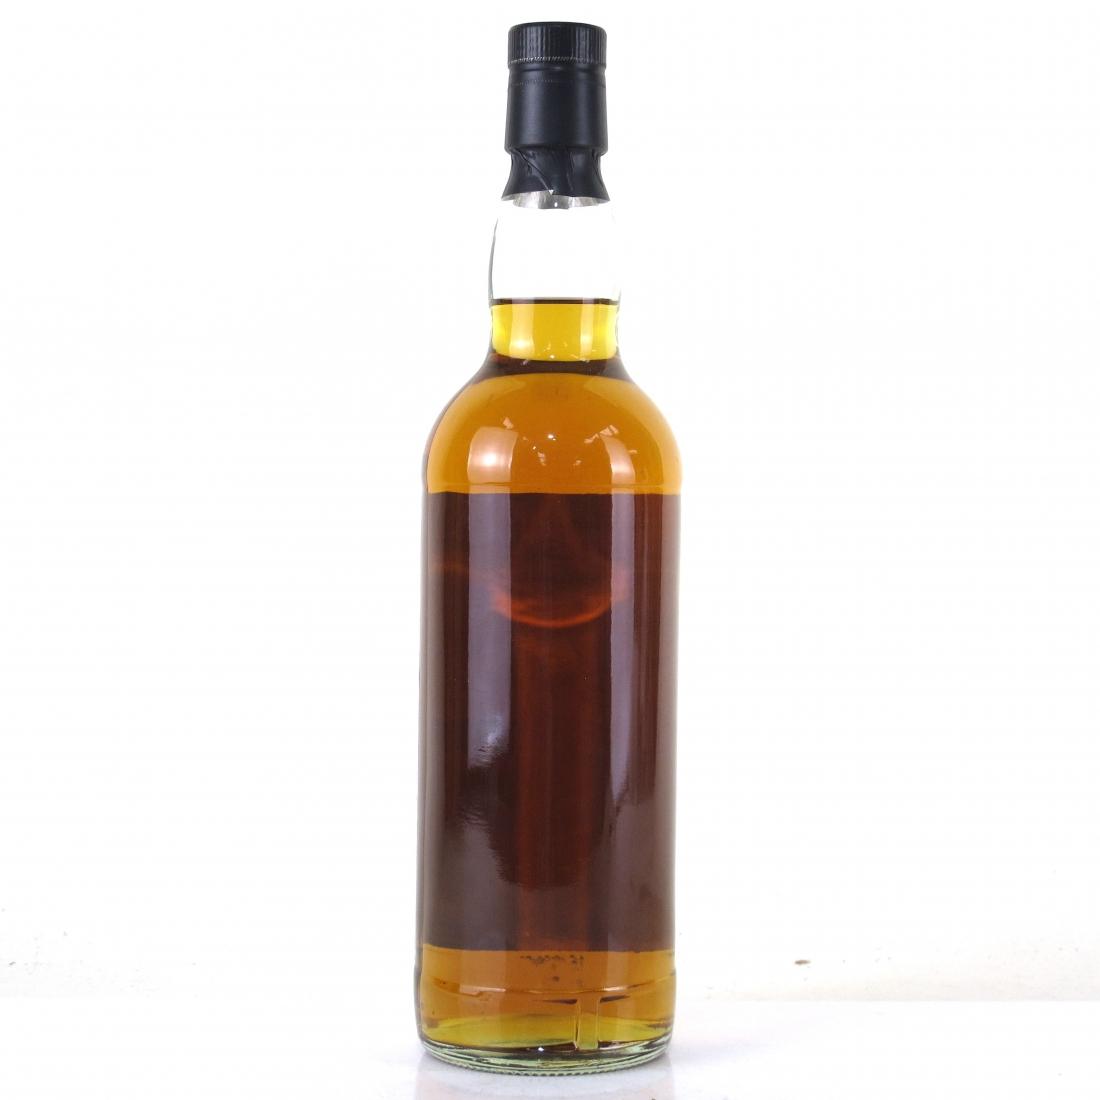 Invergordon 1972 Whisky Agency 44 Year Old